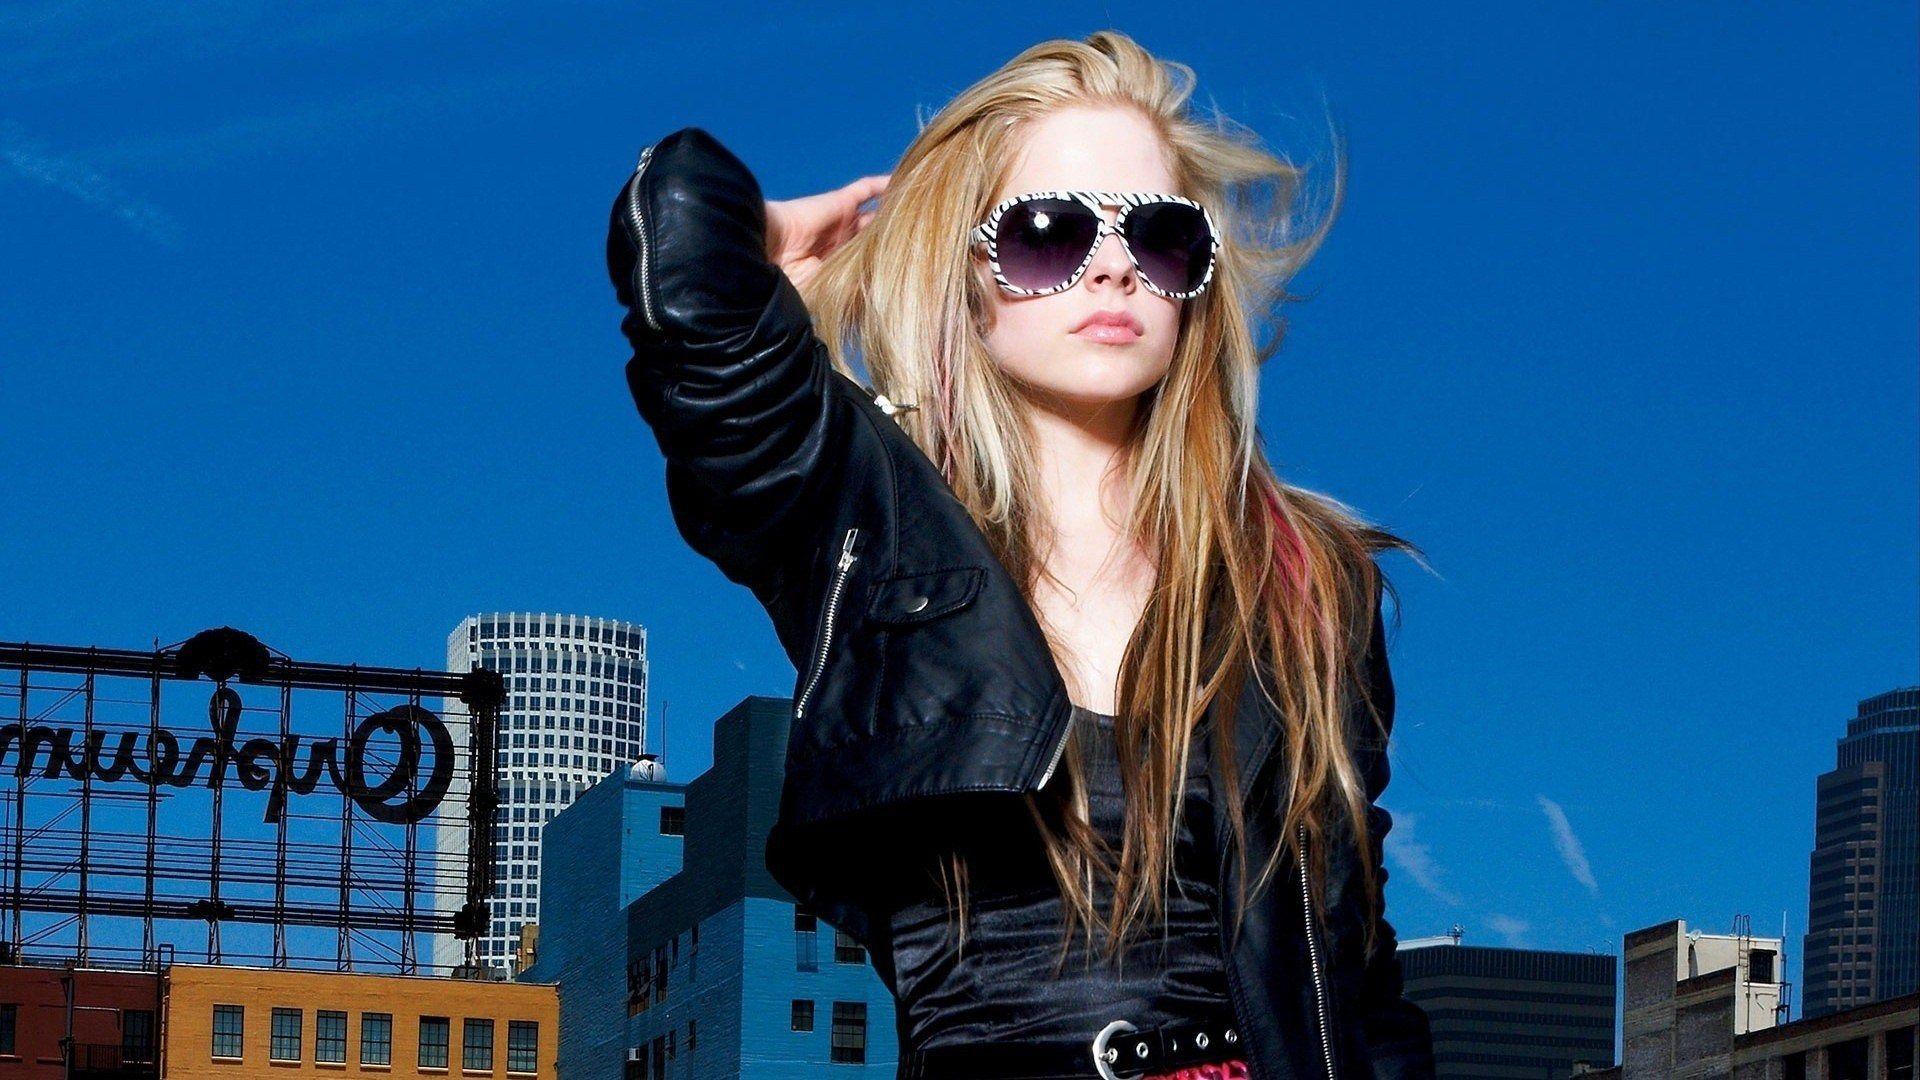 Avril Lavigne Black Star Lyrics (+playlist) (With images